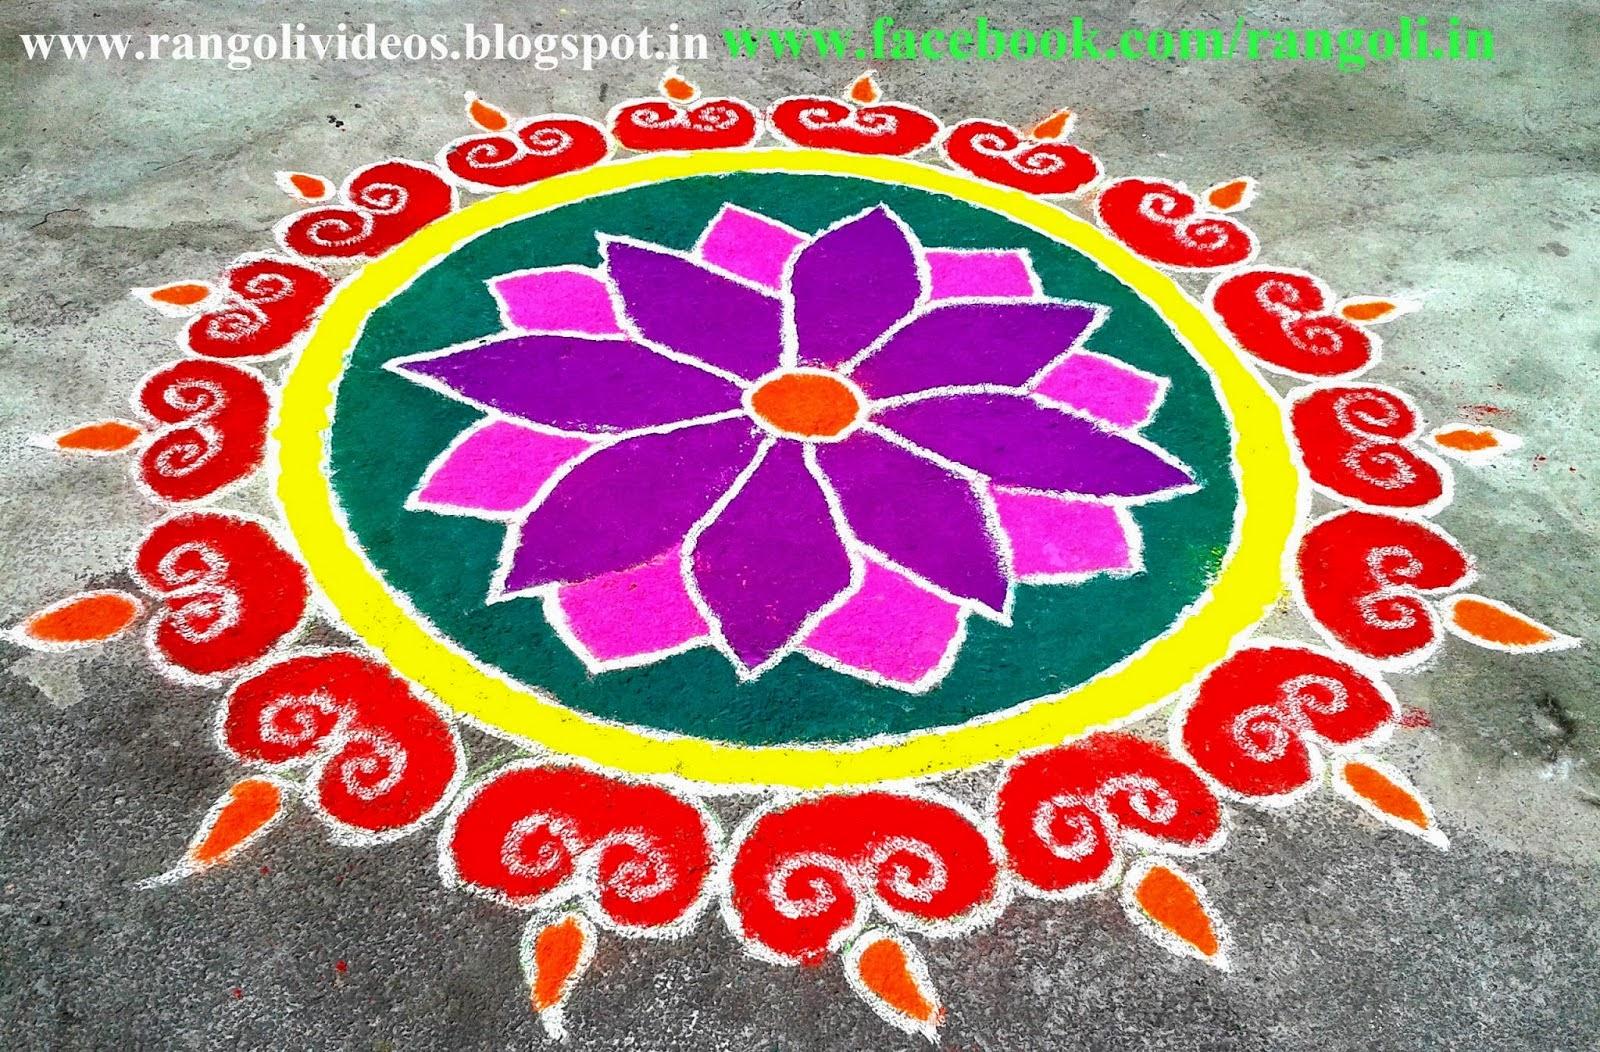 Punjab trip beautiful rangoli designs for this diwali 2014 for Home rangoli designs